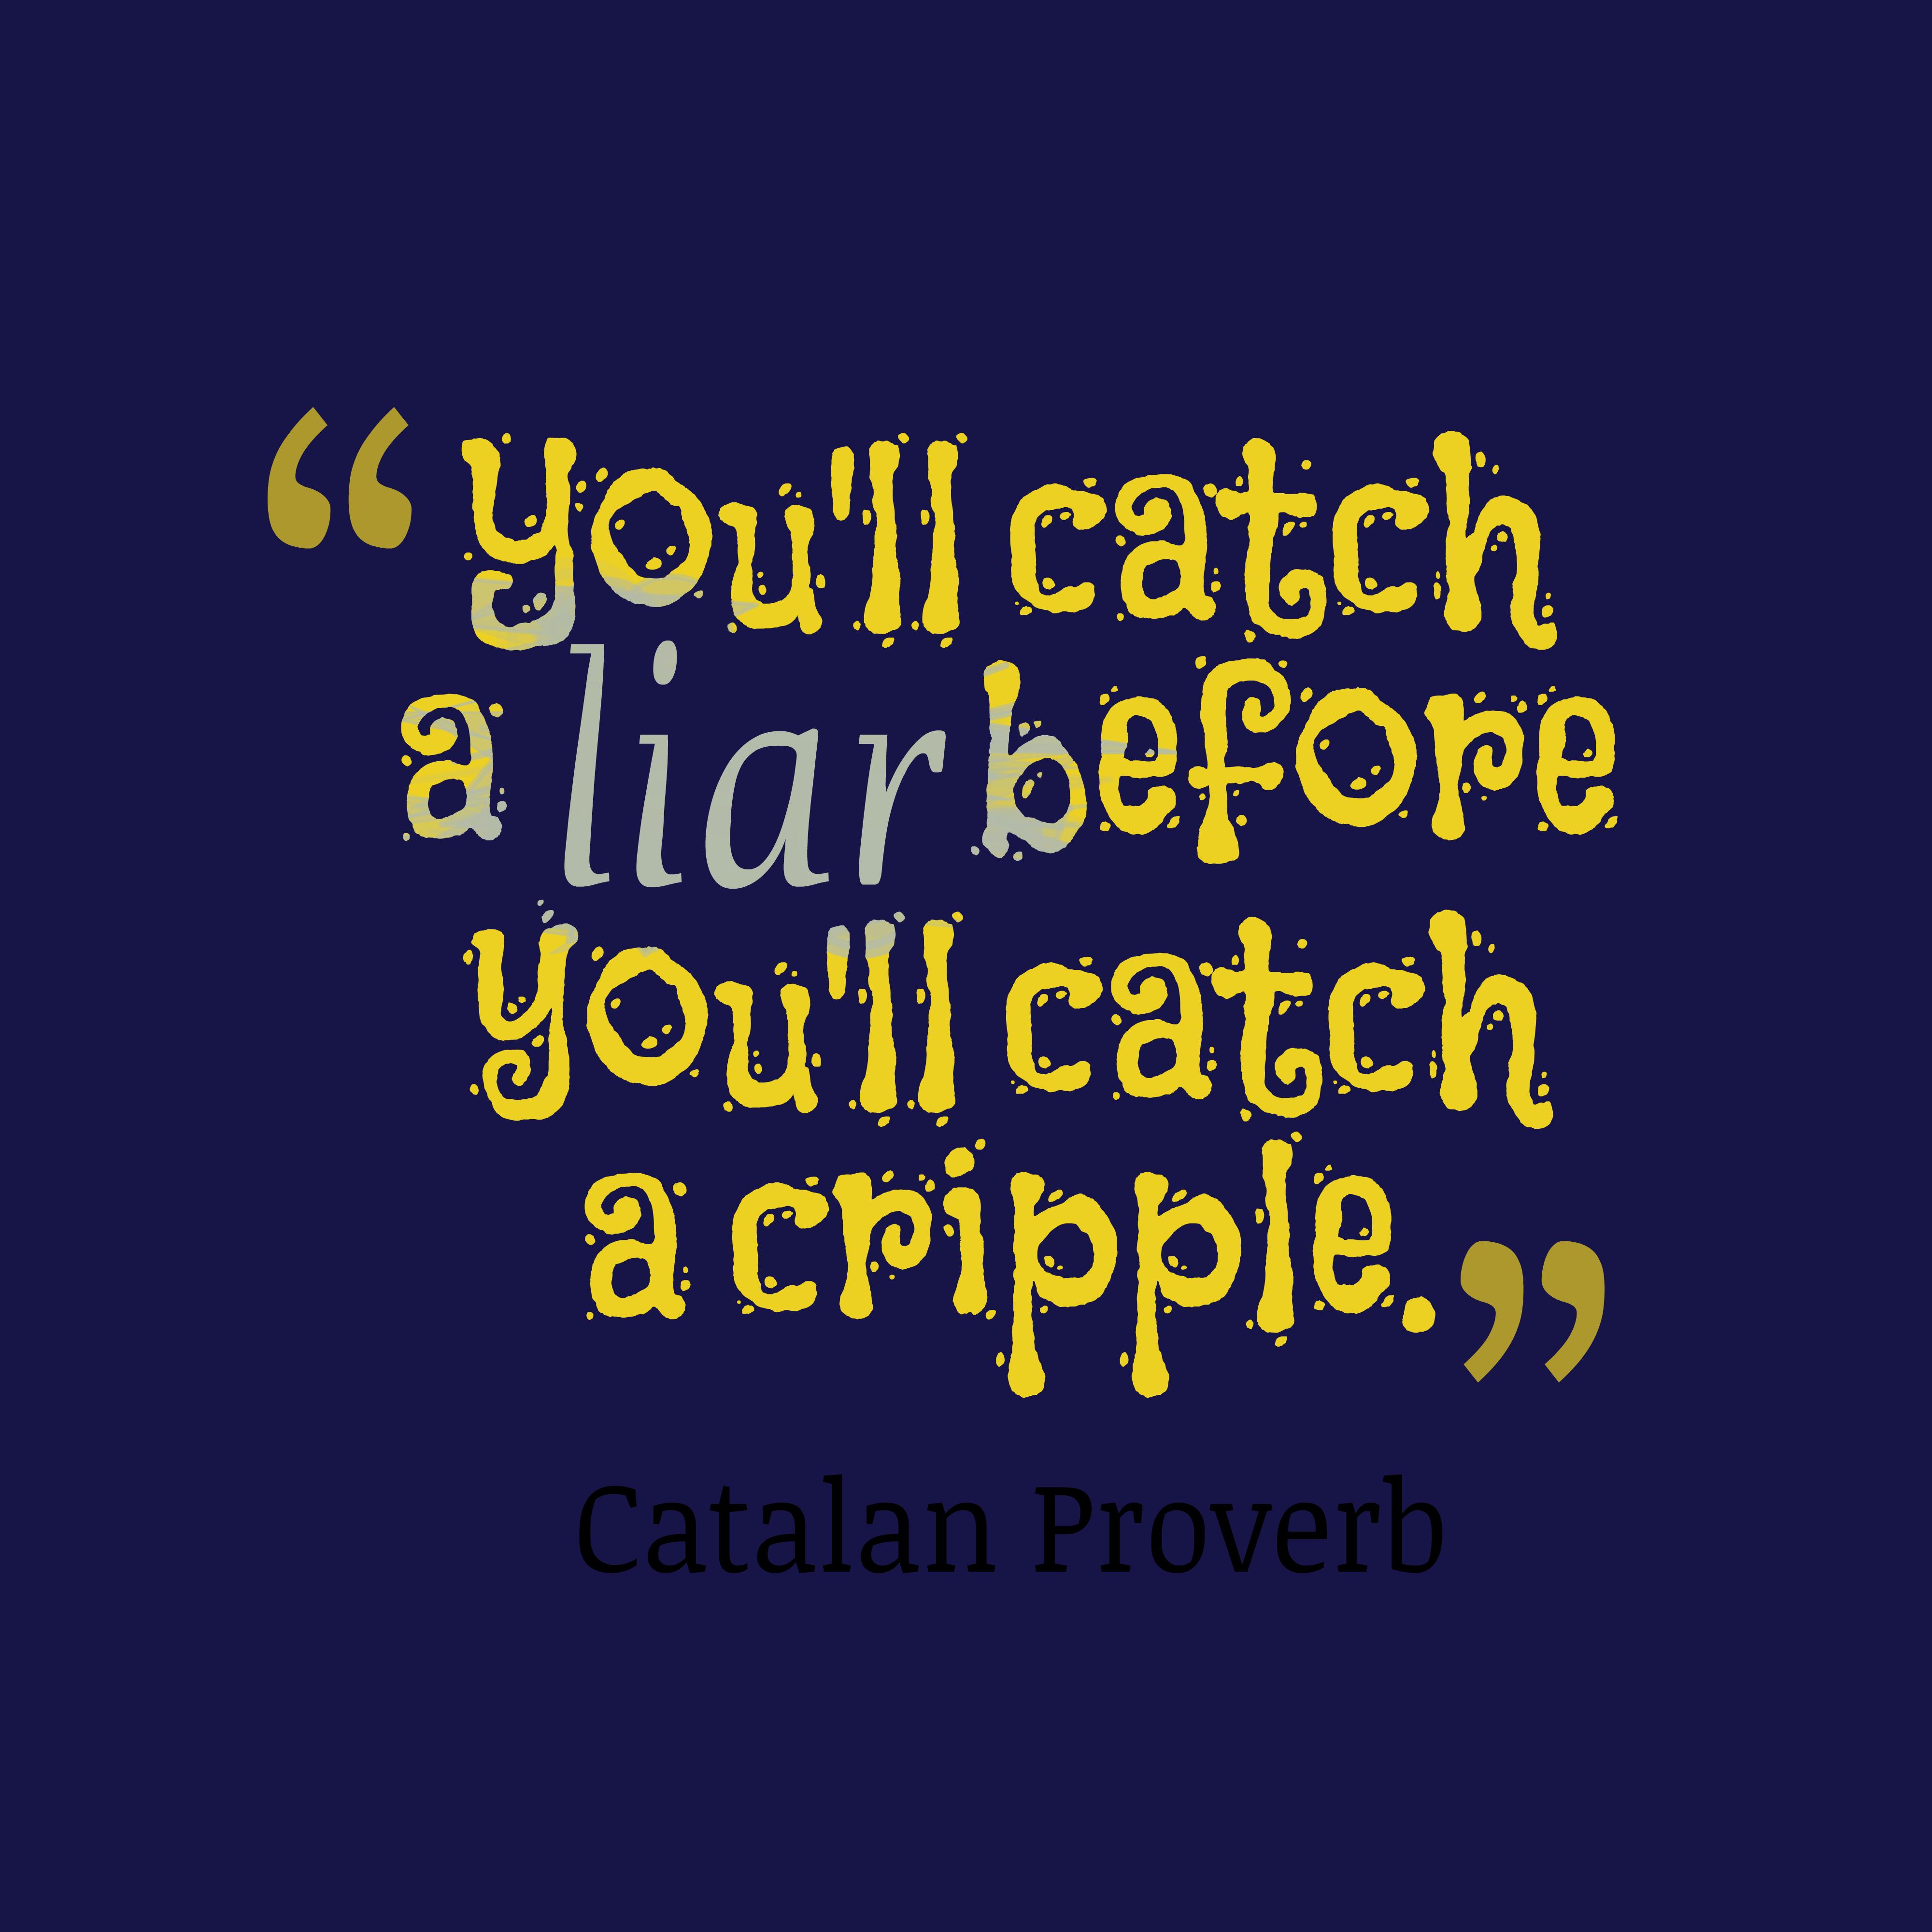 Catalan Wisdom About Liar